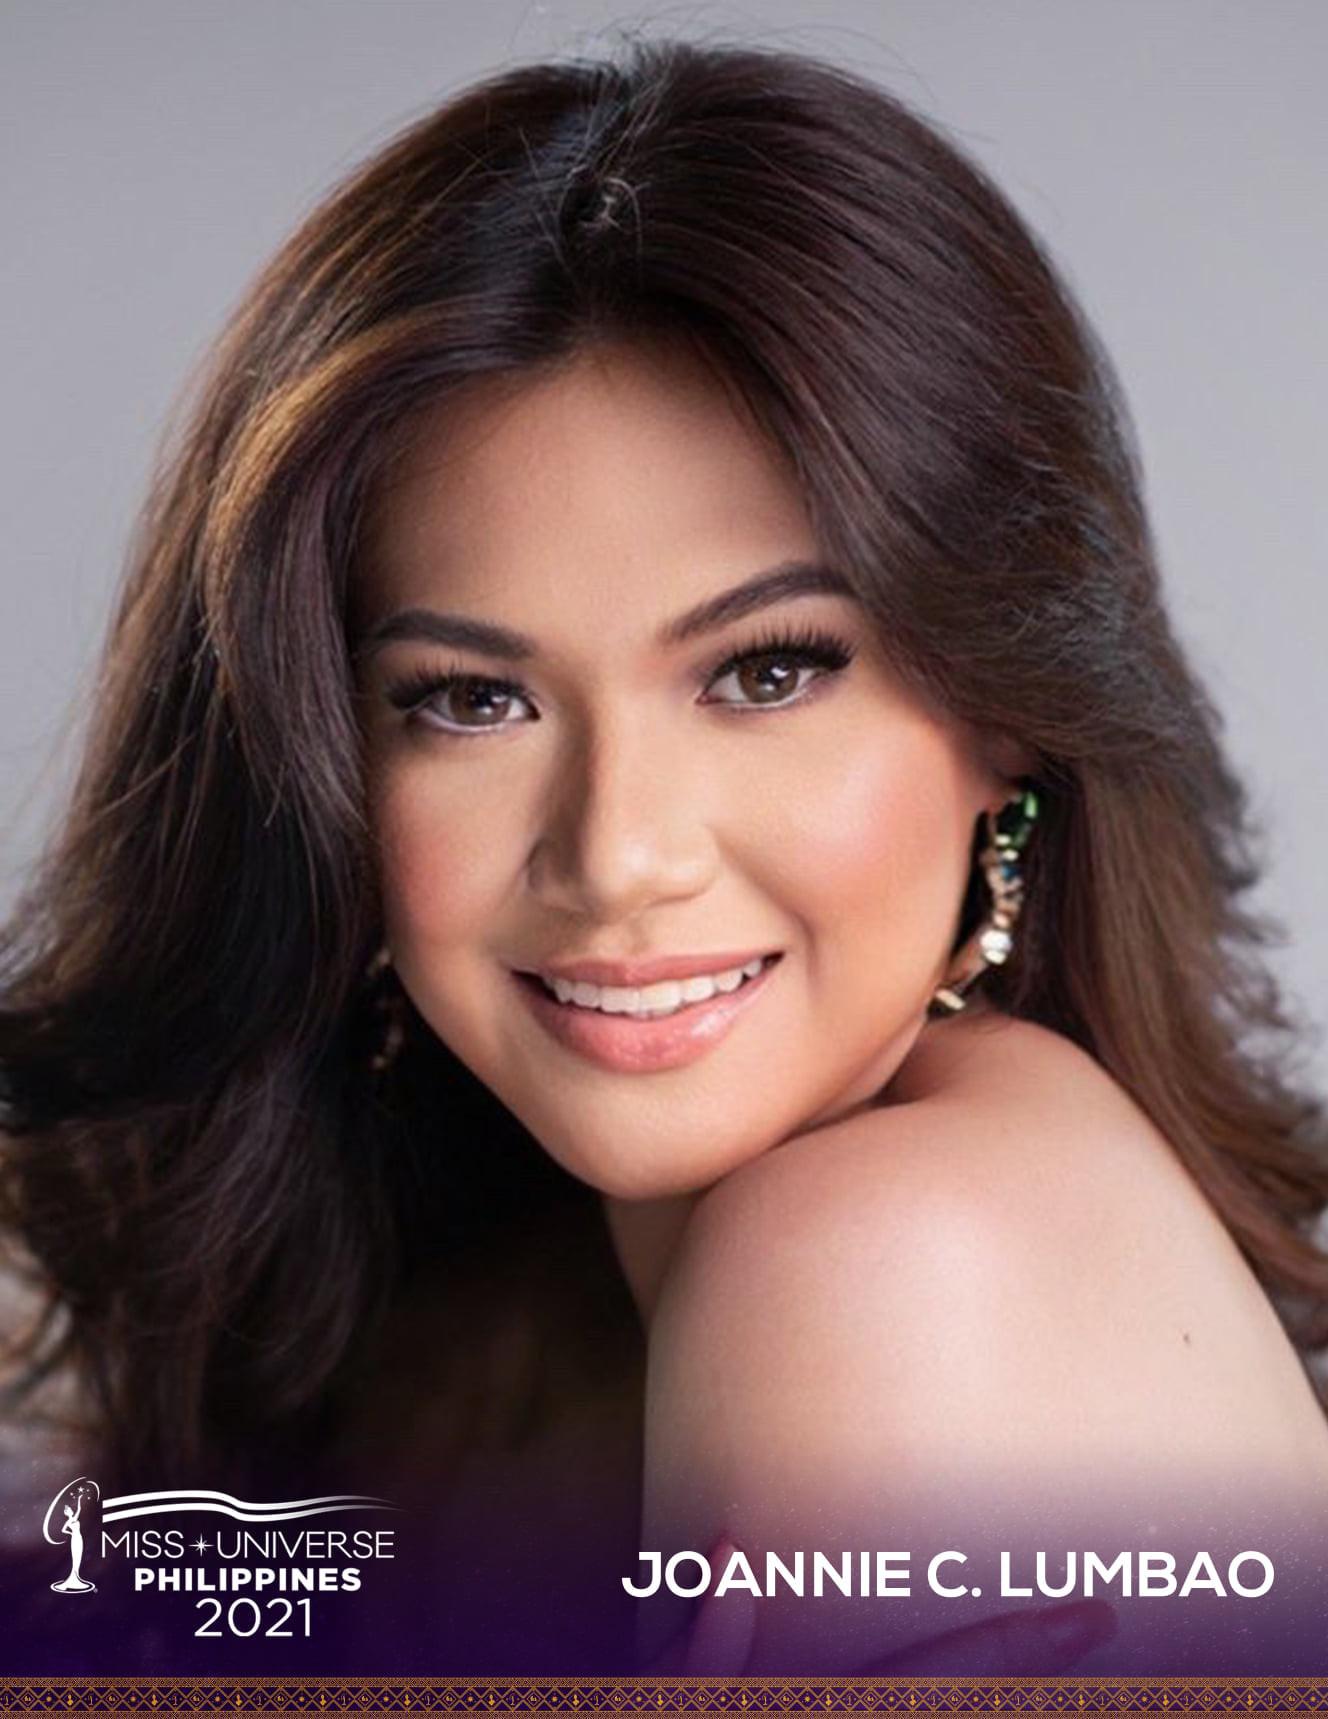 pre-candidatas a miss universe philippines 2021. - Página 7 AlMwTF